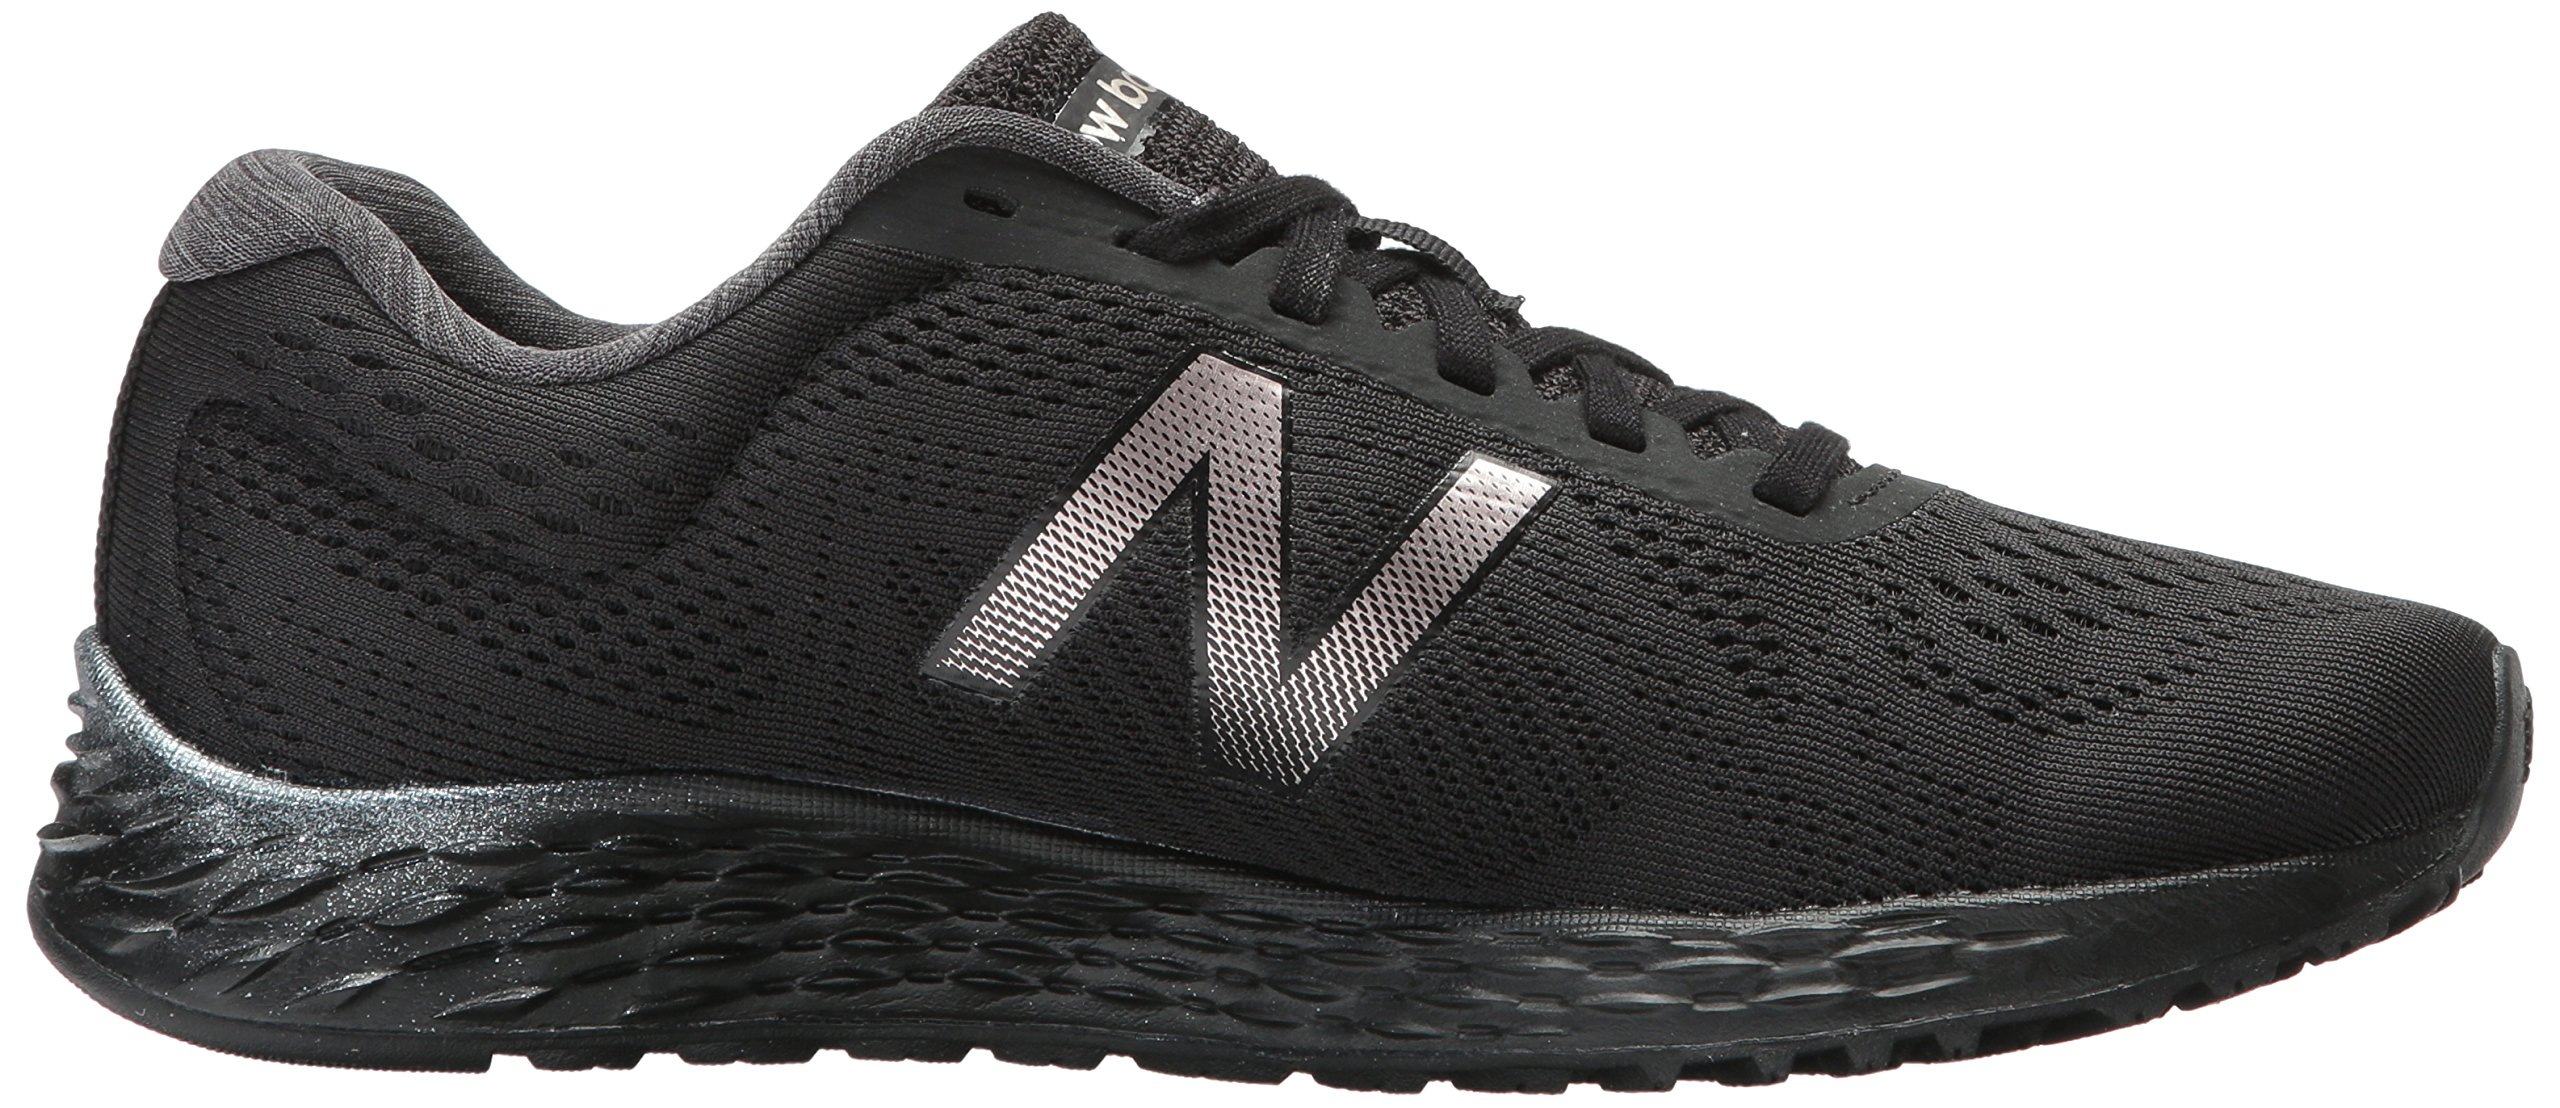 New Balance Women's Arishi v1 Fresh Foam Running Shoe, Black, 5 B US by New Balance (Image #7)